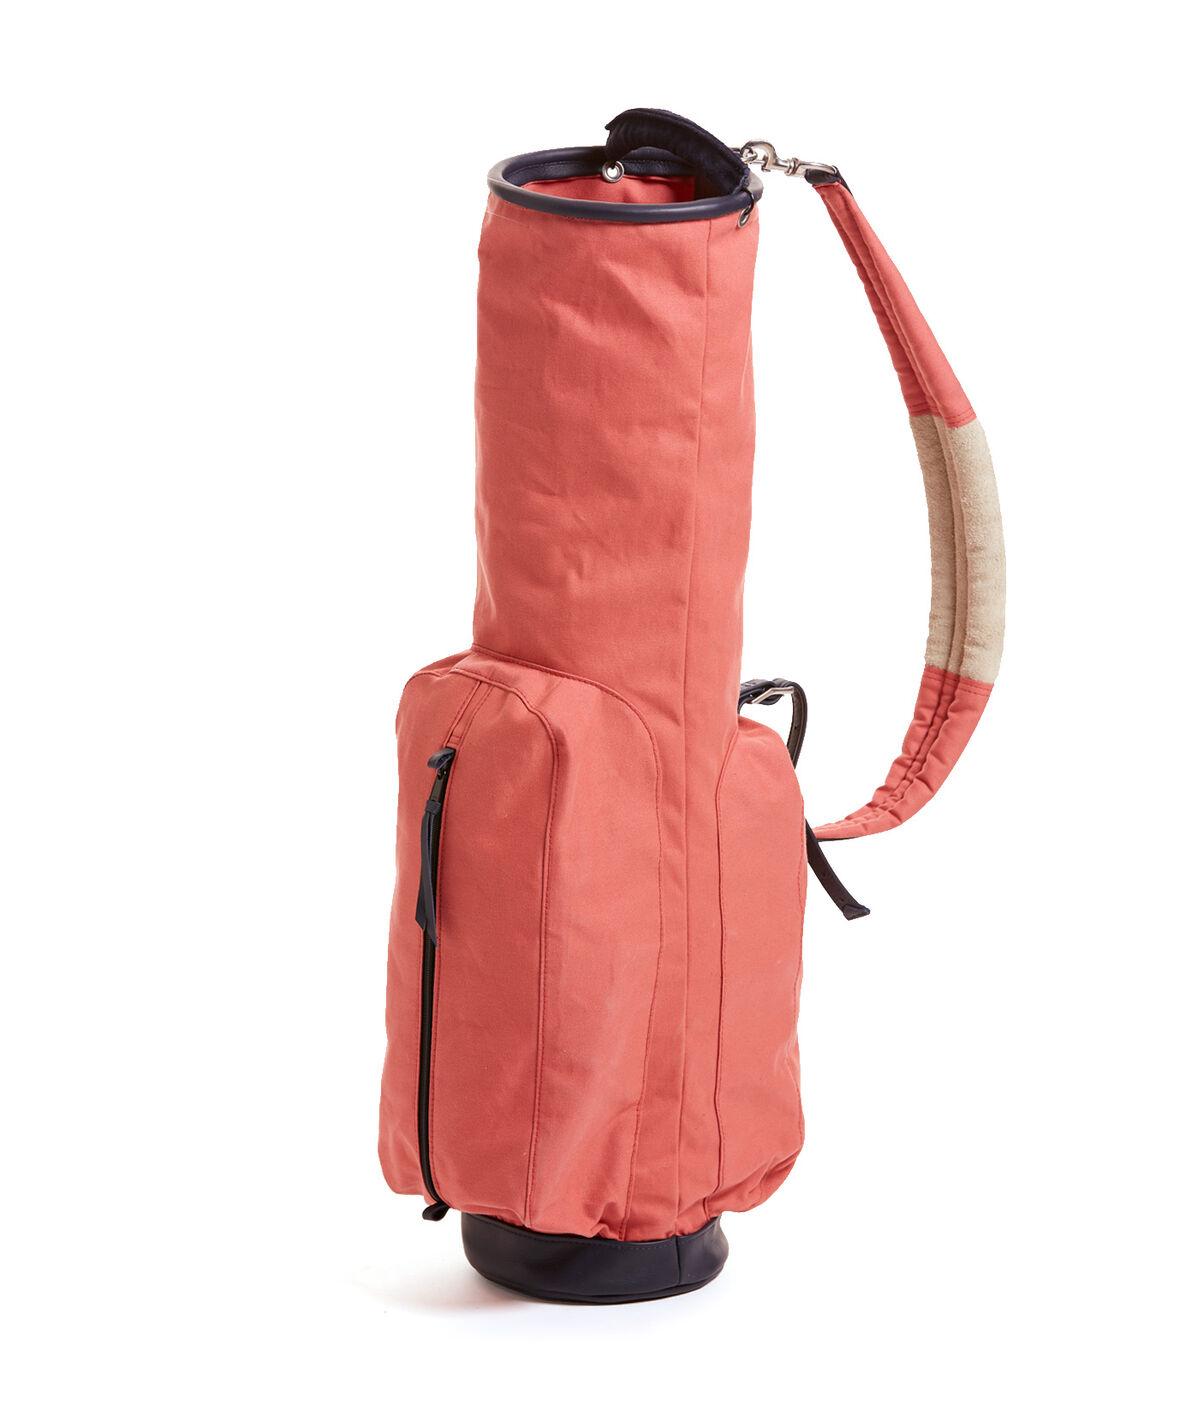 b4c16bc4993 Mackenzie Golf Bag